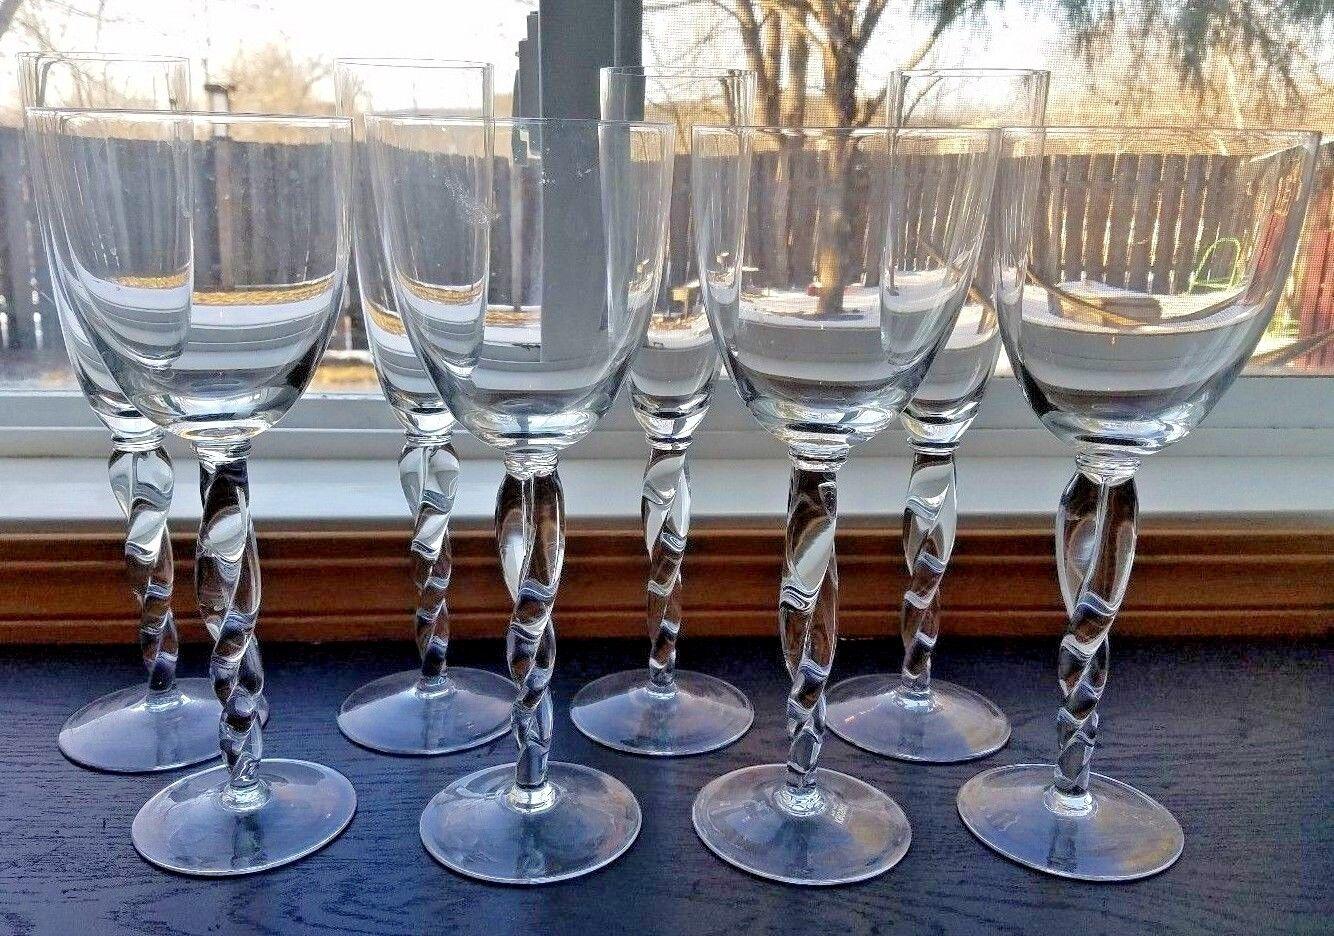 Elegantt   Set of 8 Krosno glasses; 4 water and 4 wine glasses... Poland